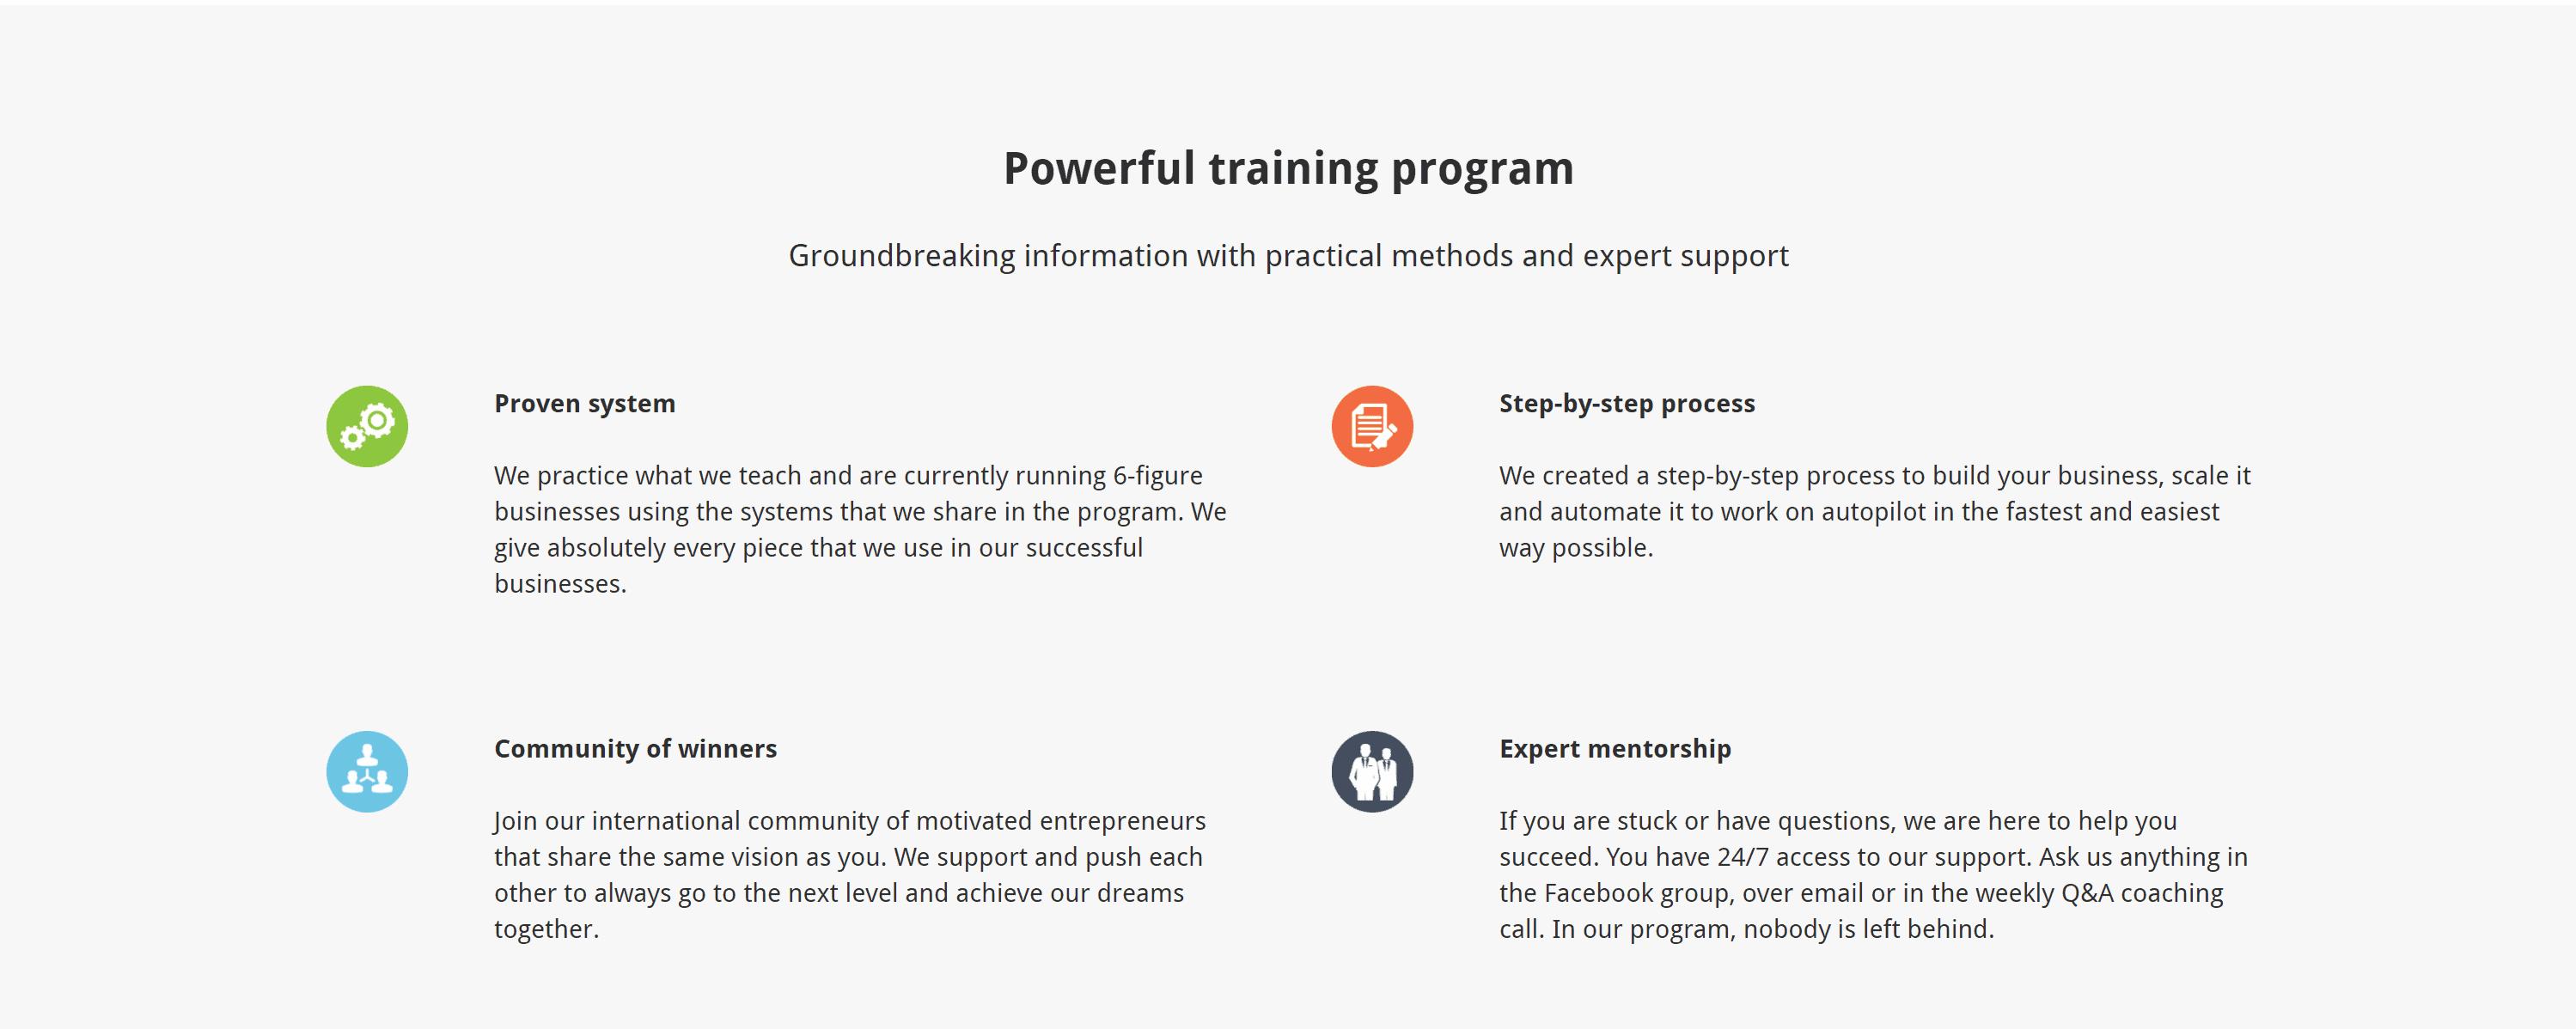 Drop servicing bluepring training program- dylan singley review